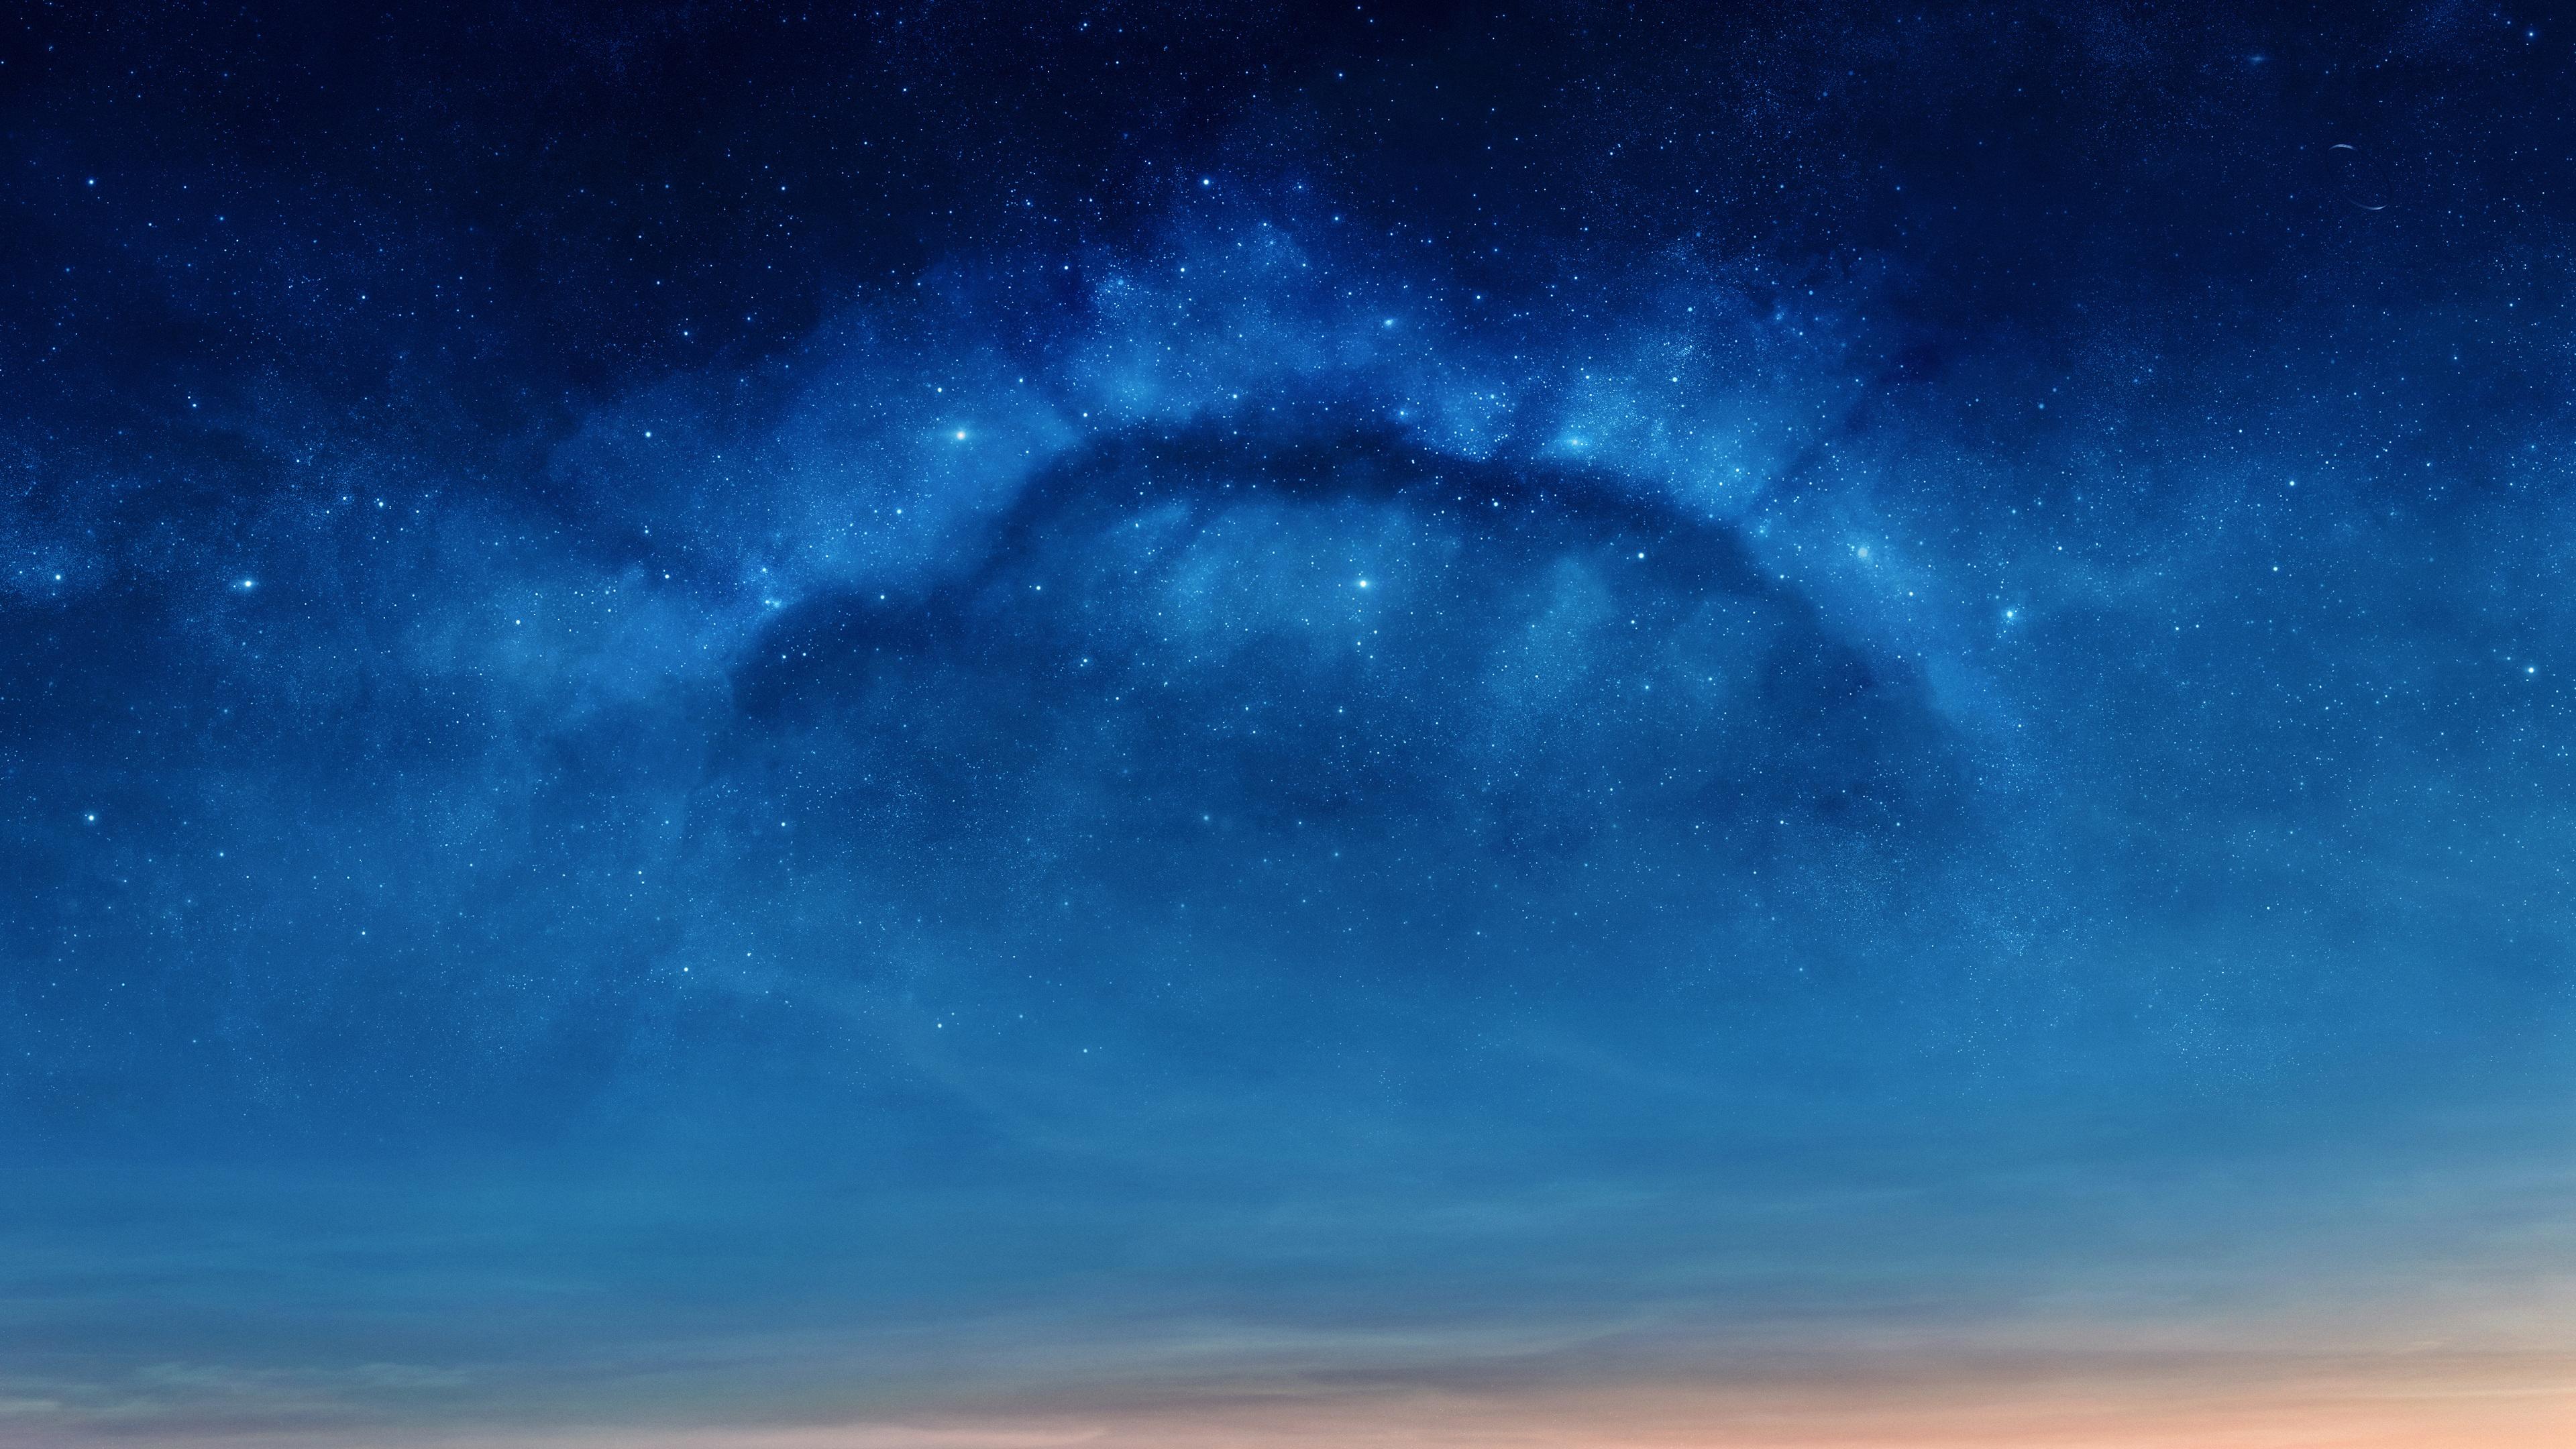 blue dawn halo scifi nebula space digital art 4k 1546278906 - Blue Dawn Halo Scifi Nebula Space Digital Art 4k - space wallpapers, nebula wallpapers, hd-wallpapers, digital universe wallpapers, digital art wallpapers, deviantart wallpapers, artwork wallpapers, artist wallpapers, 5k wallpapers, 4k-wallpapers